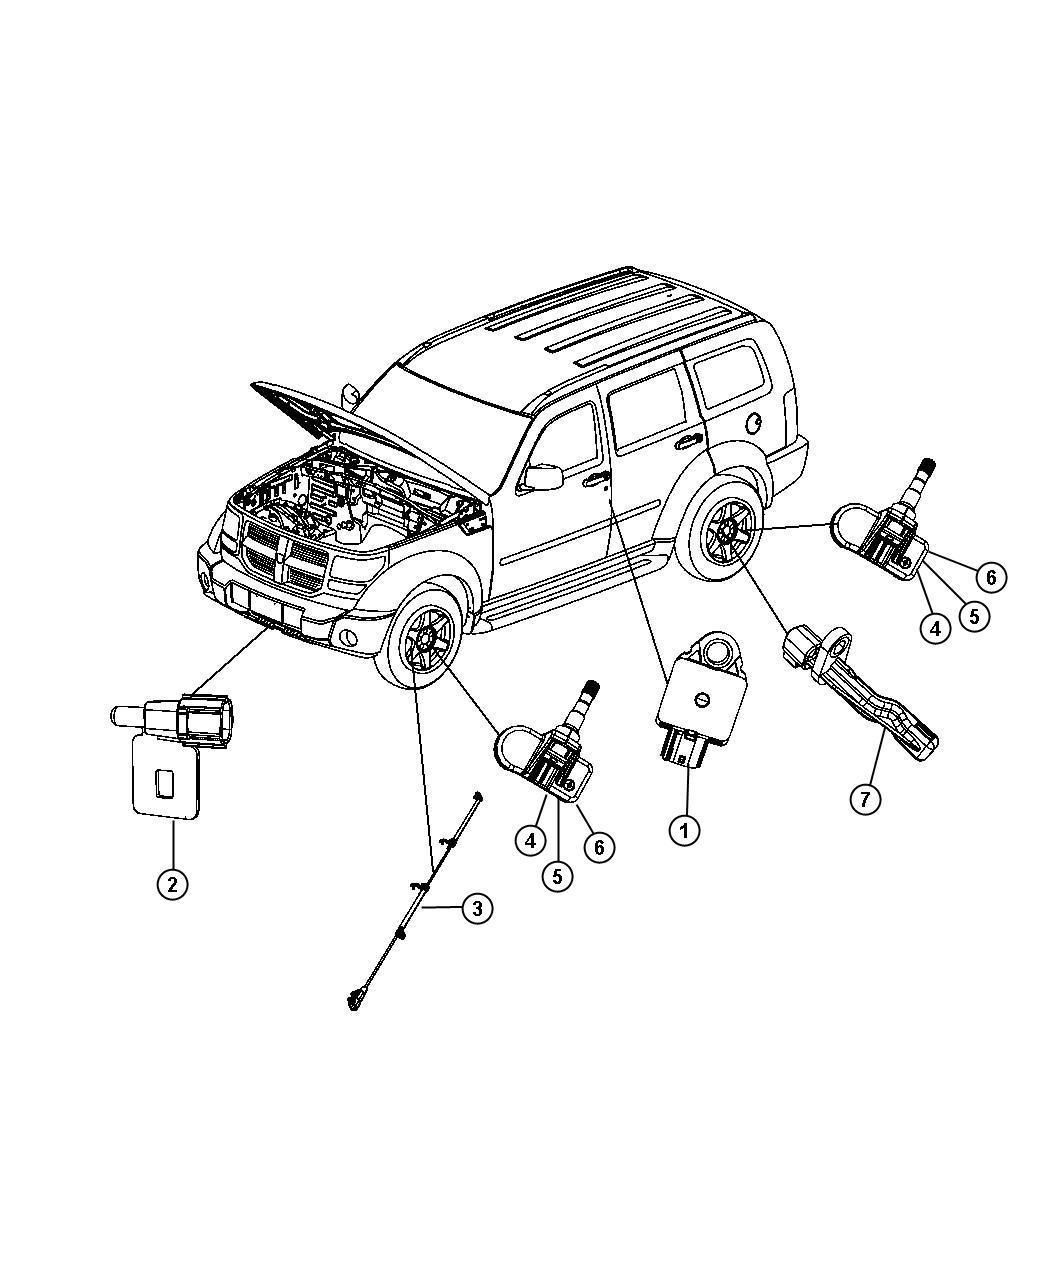 2008 Dodge NITRO Sensor kit, sensor package. Anti-lock